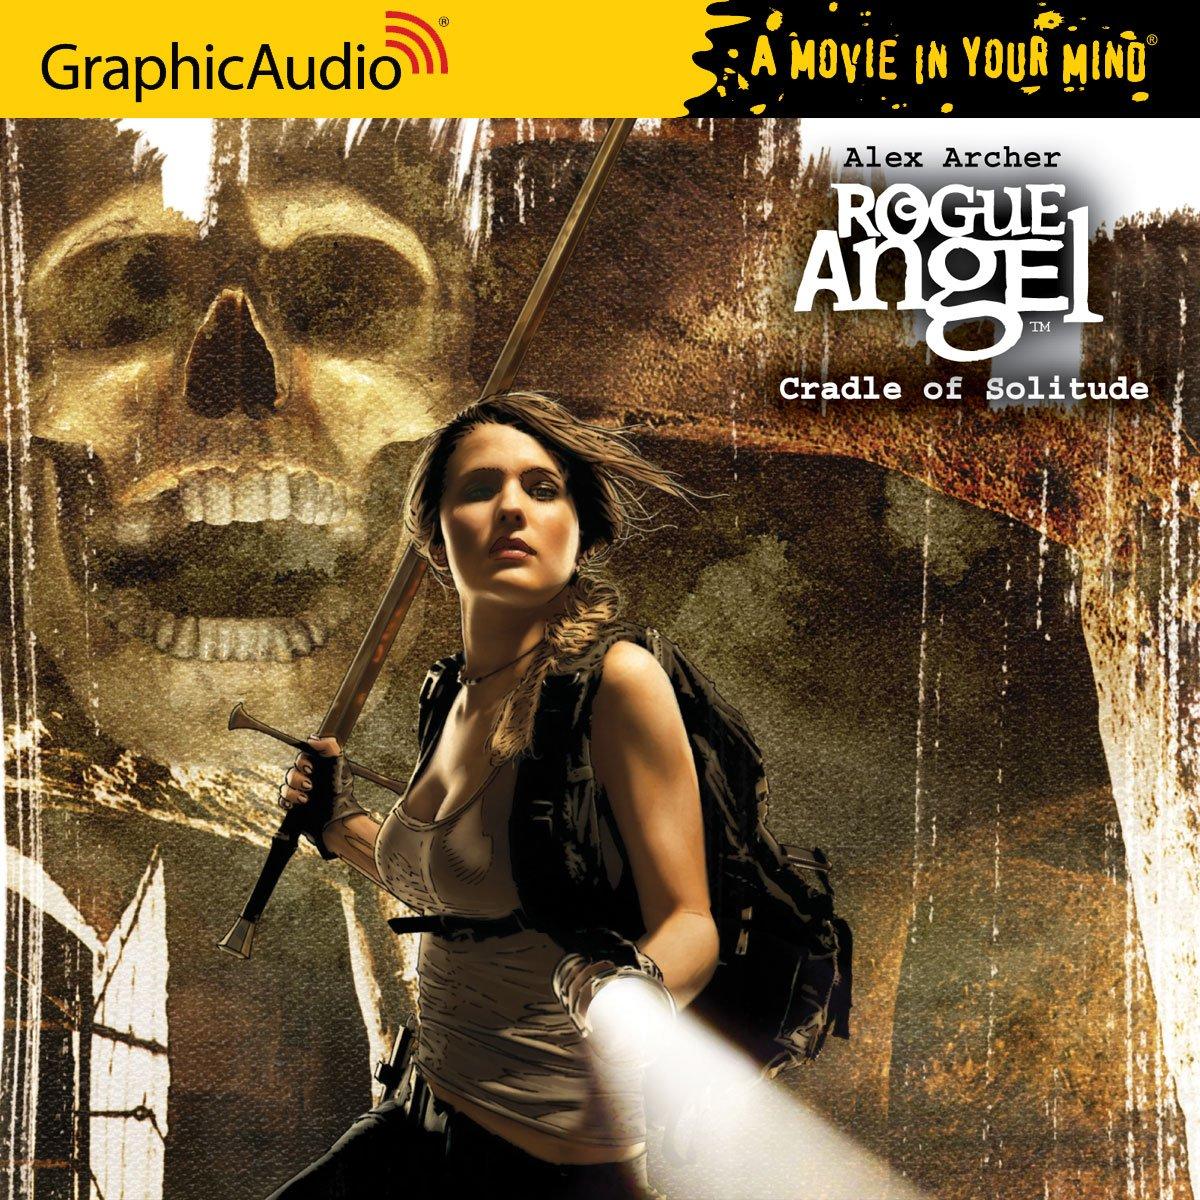 Rogue Angel 33 - Cradle of Solitude: Alex Archer: 9781599508719:  Amazon.com: Books